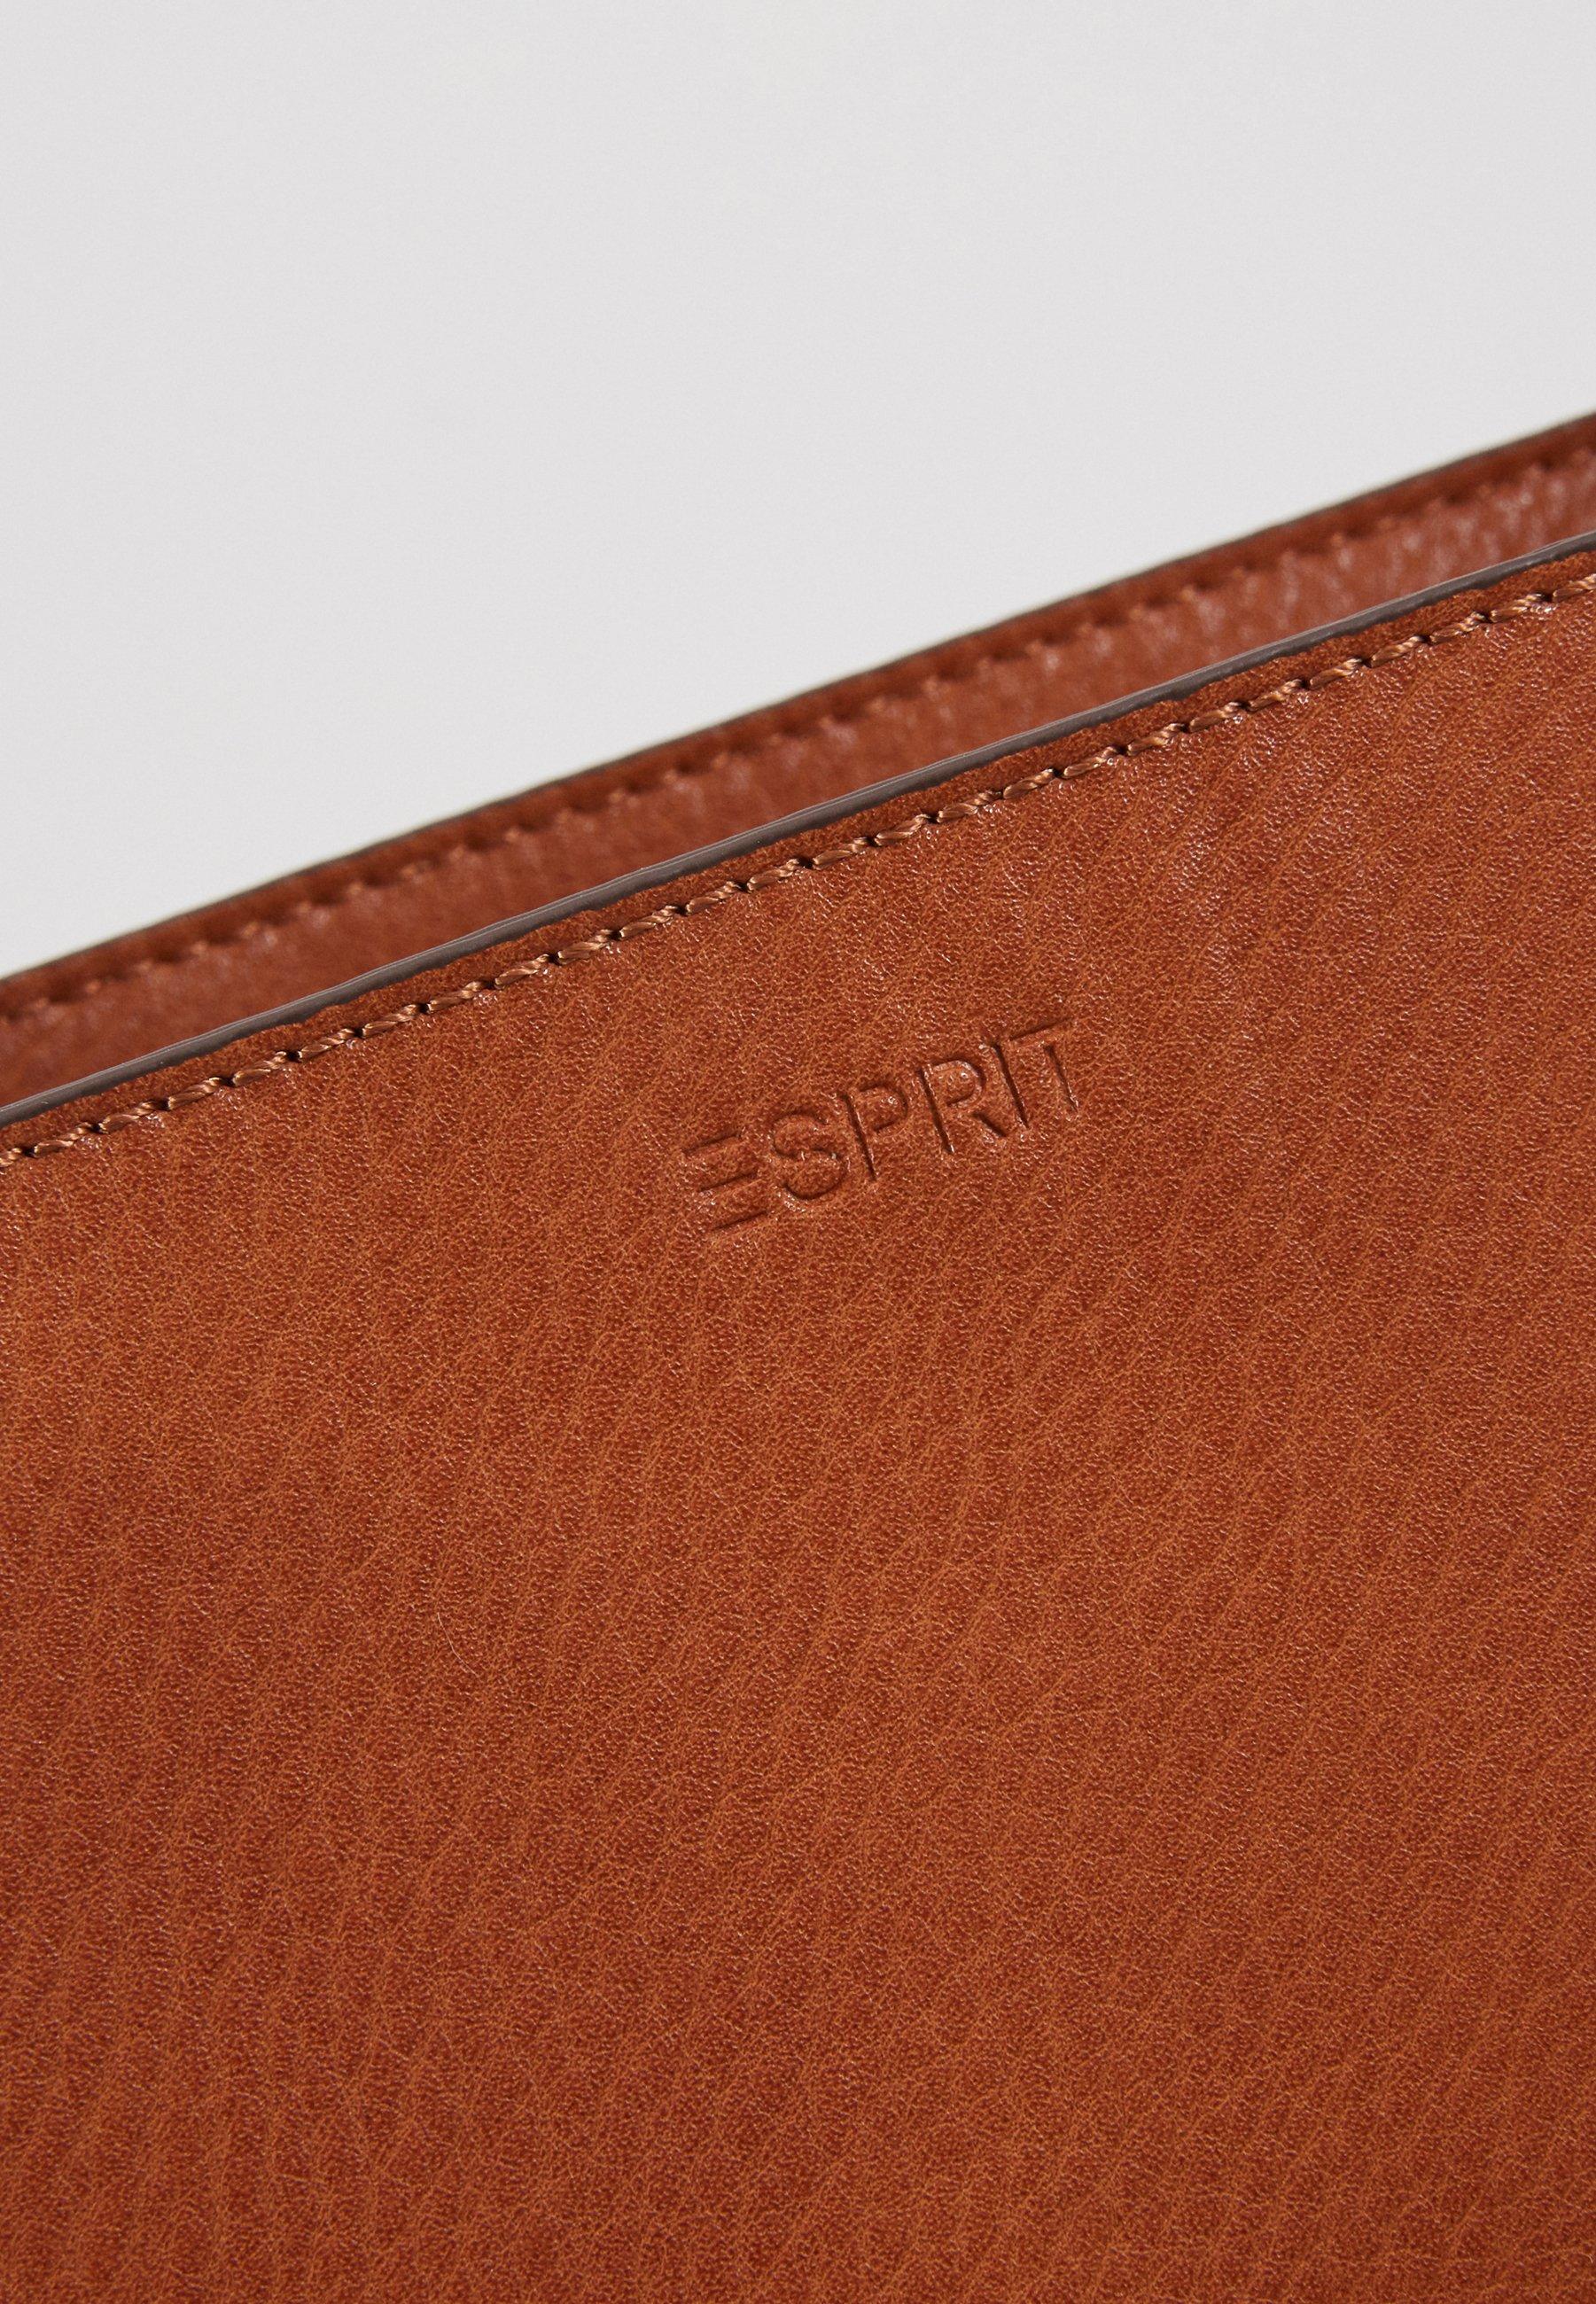 Esprit Borsa A Mano - Rust Brown lTthJz1